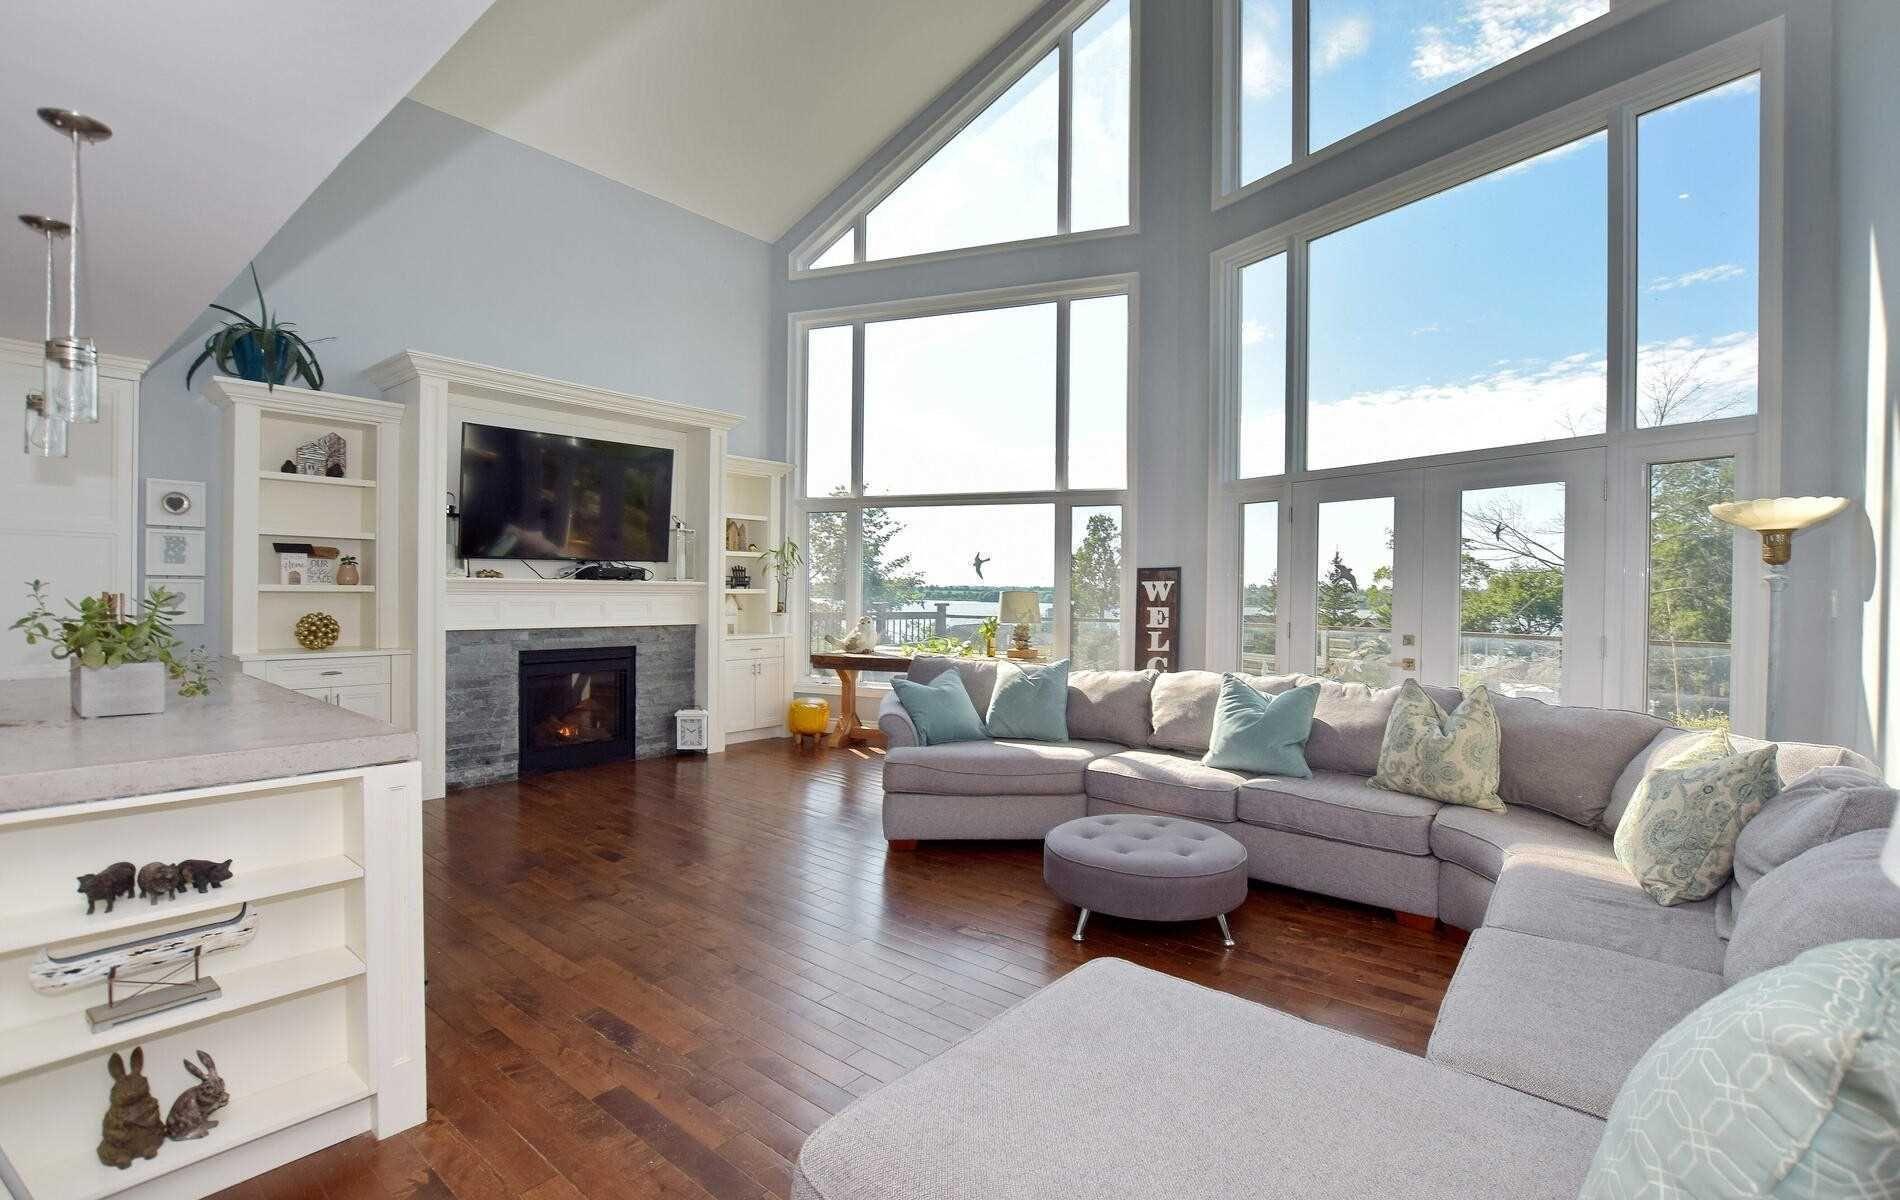 Main Photo: 555 Fralicks Beach Road in Scugog: Rural Scugog House (3-Storey) for sale : MLS®# E5290598